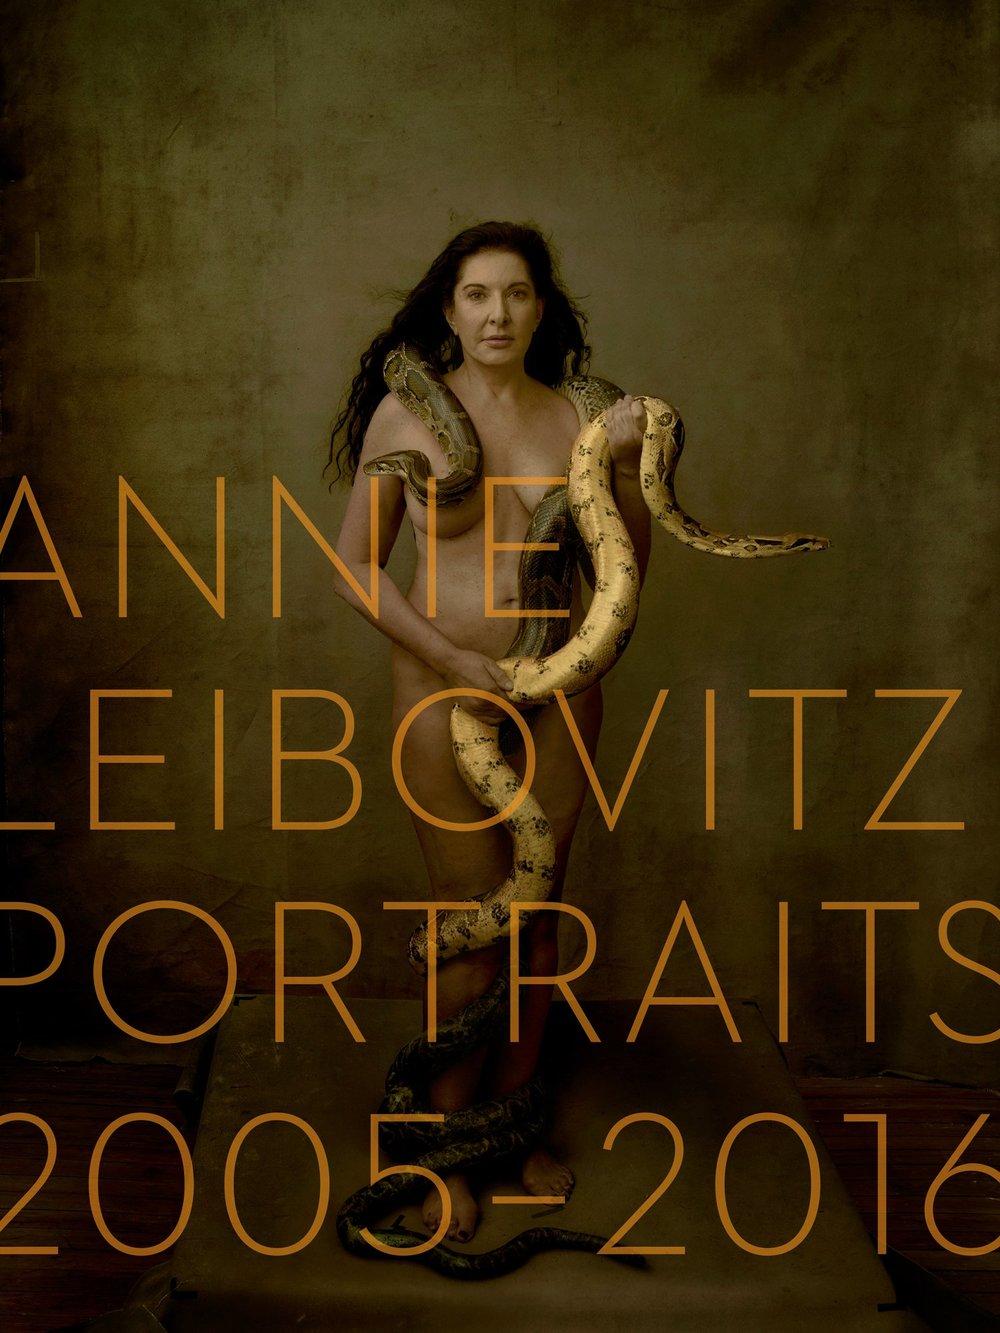 annalebovitz-photography-book-bestof-bookguide